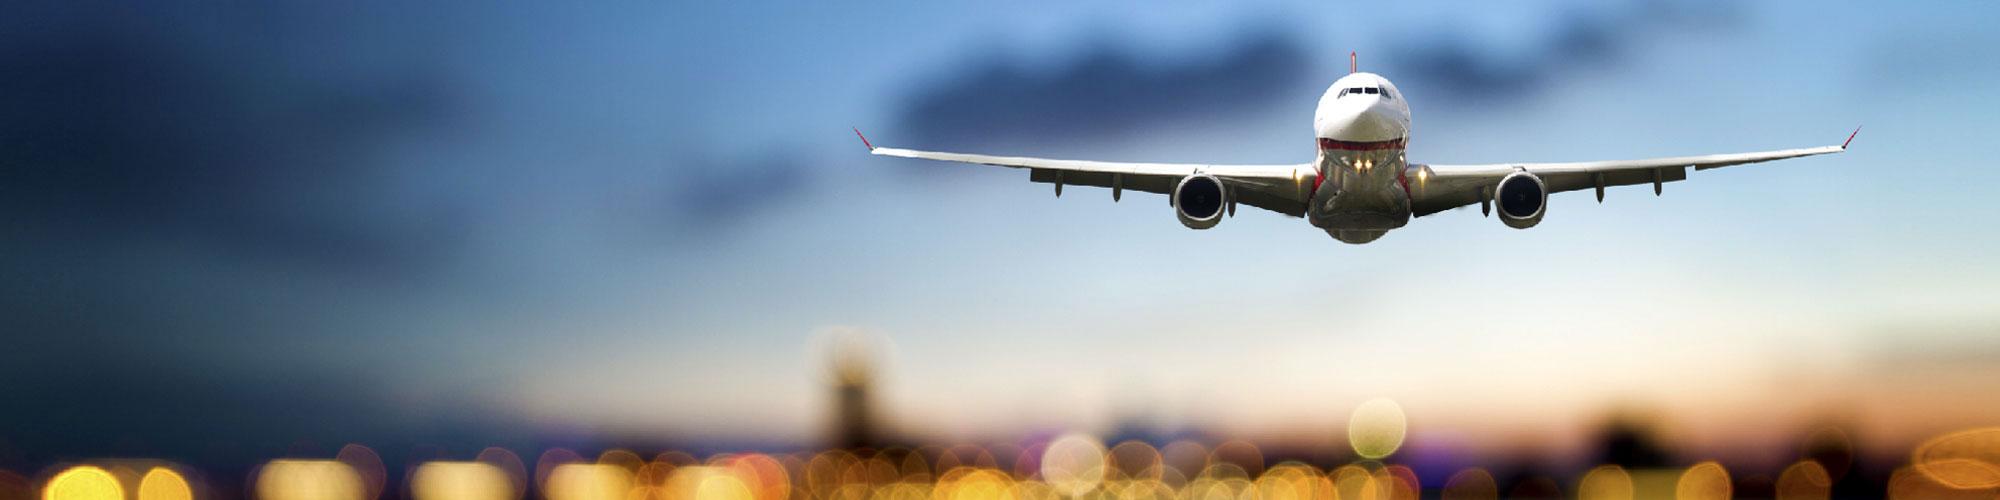 travel insurance ratings photo - 1